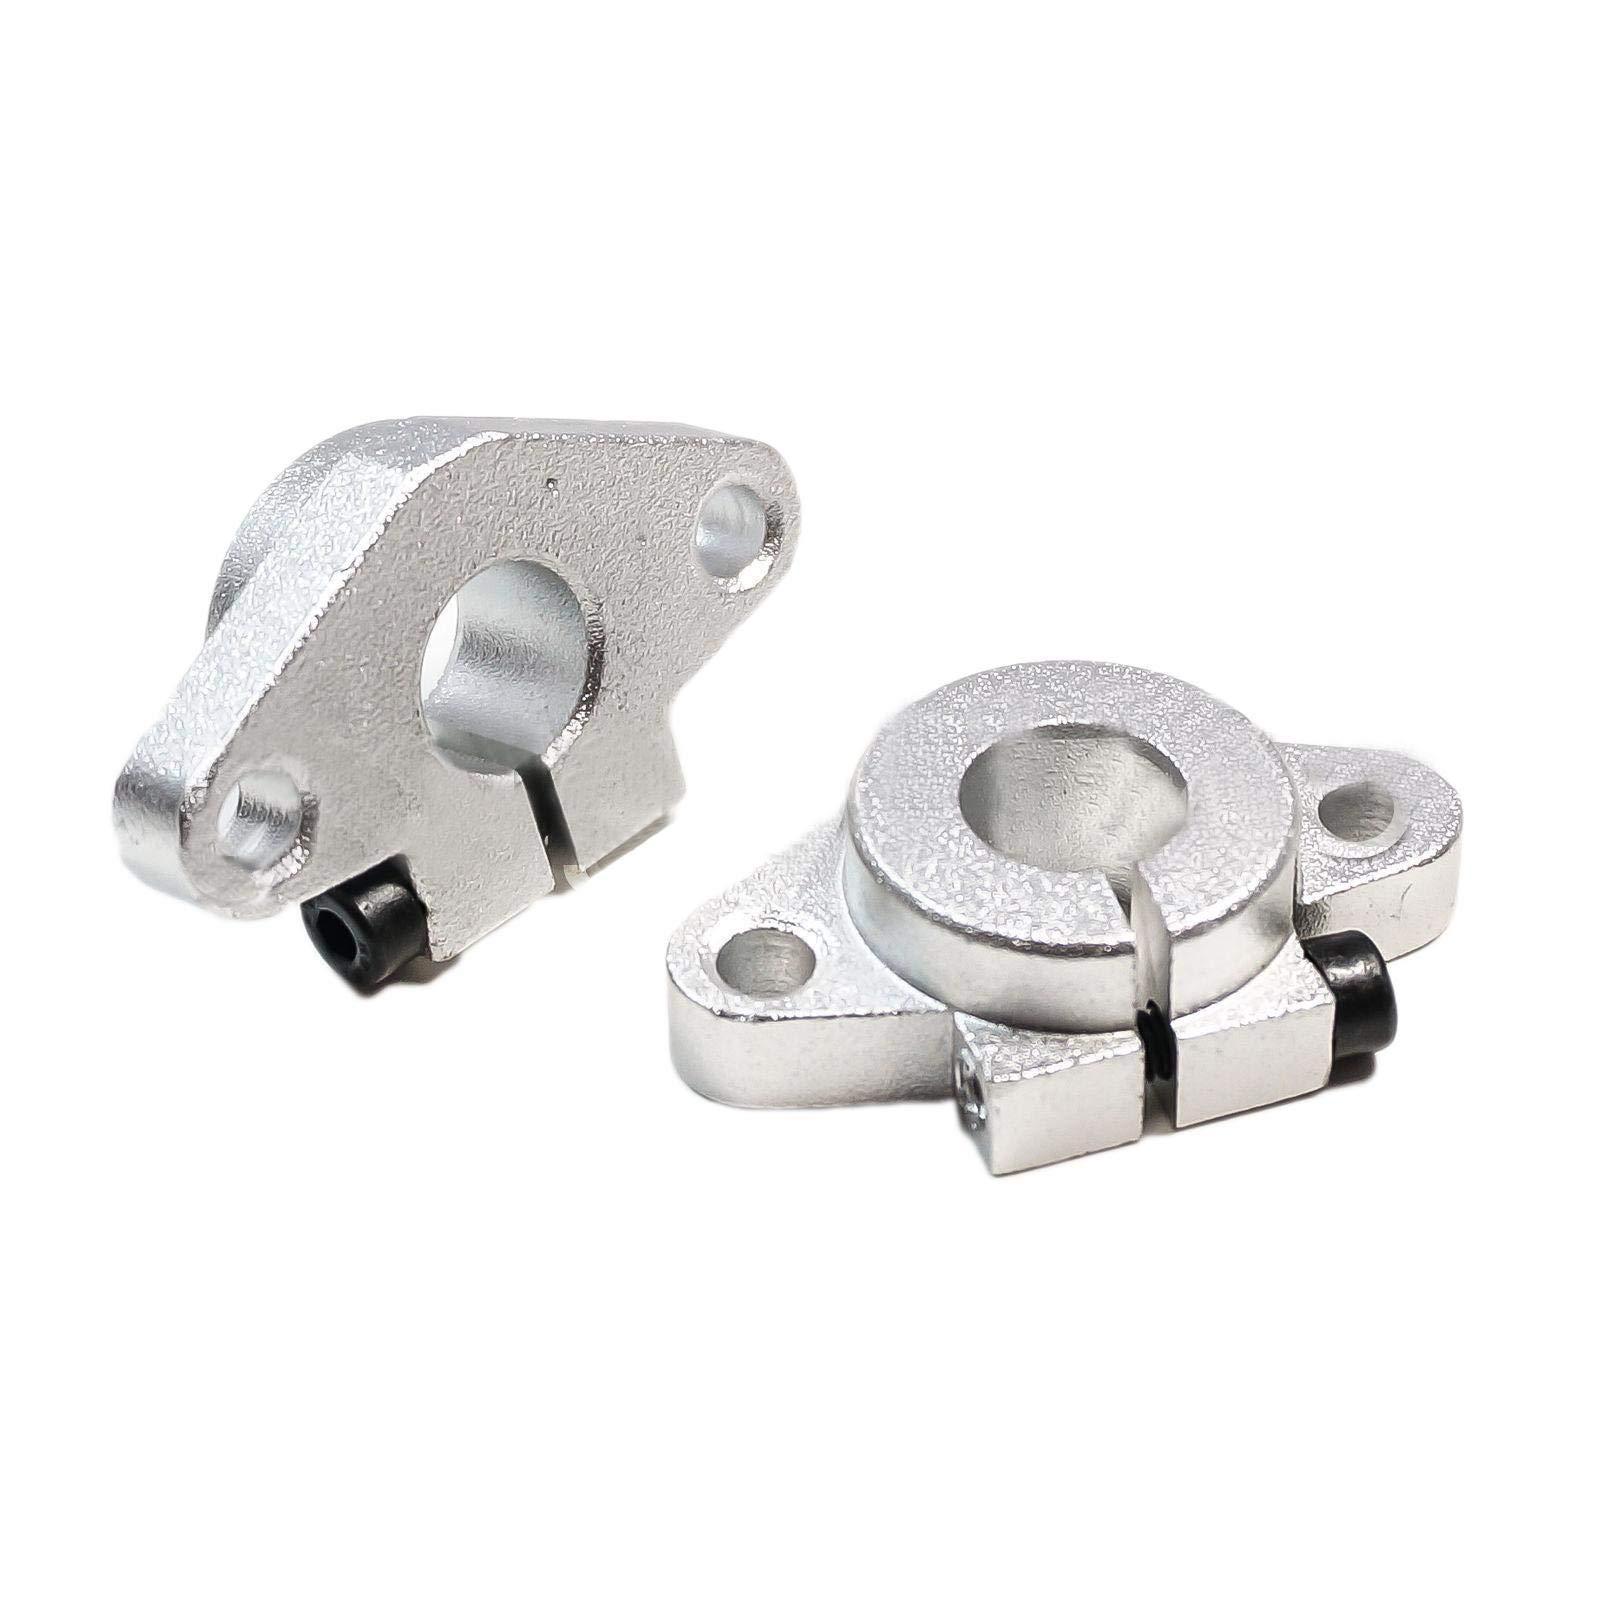 4pcs Aluminum SHF16 16mm Linear Rod Rail Shaft Support Motion CNC Route